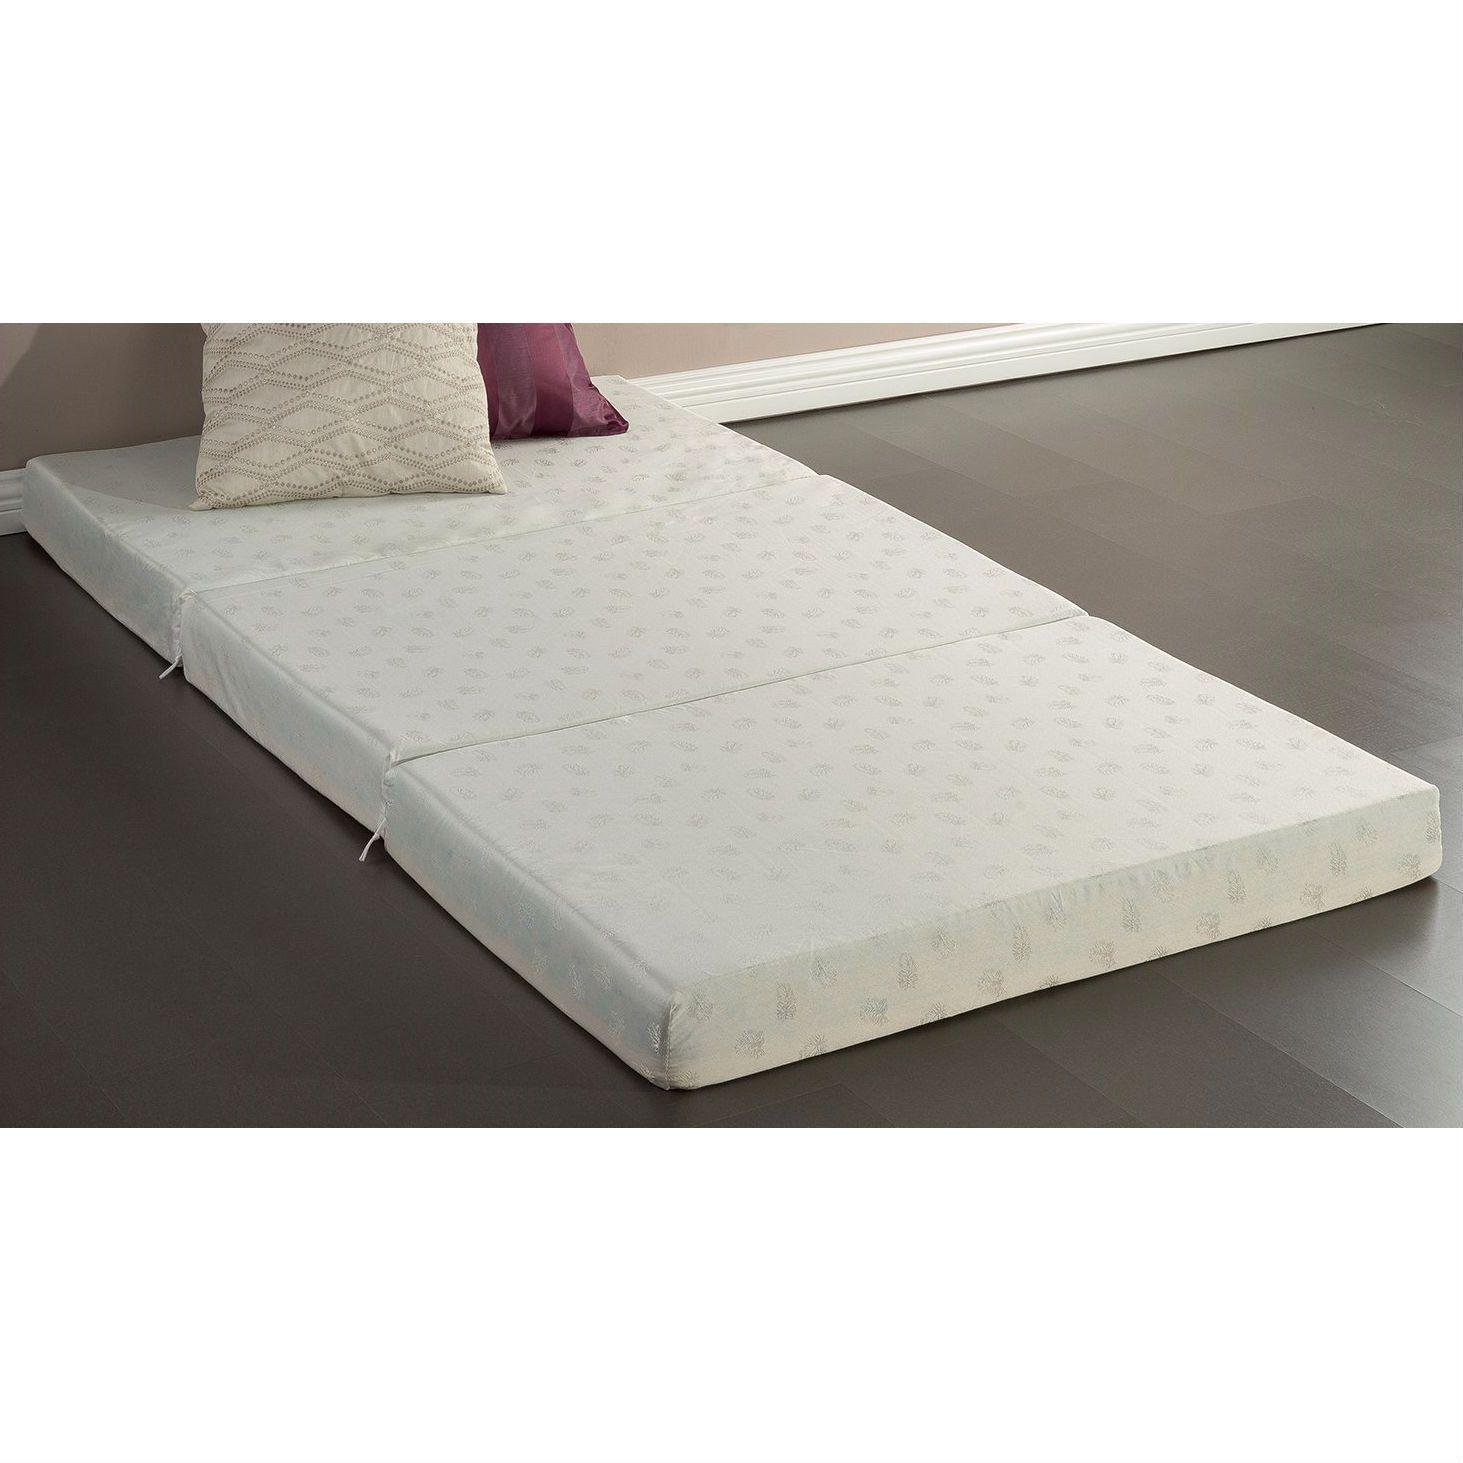 twin size mattress foam. Twin Size 4-inch Thick Memory Foam Guest Bed Mat Folding Mattress Pinterest